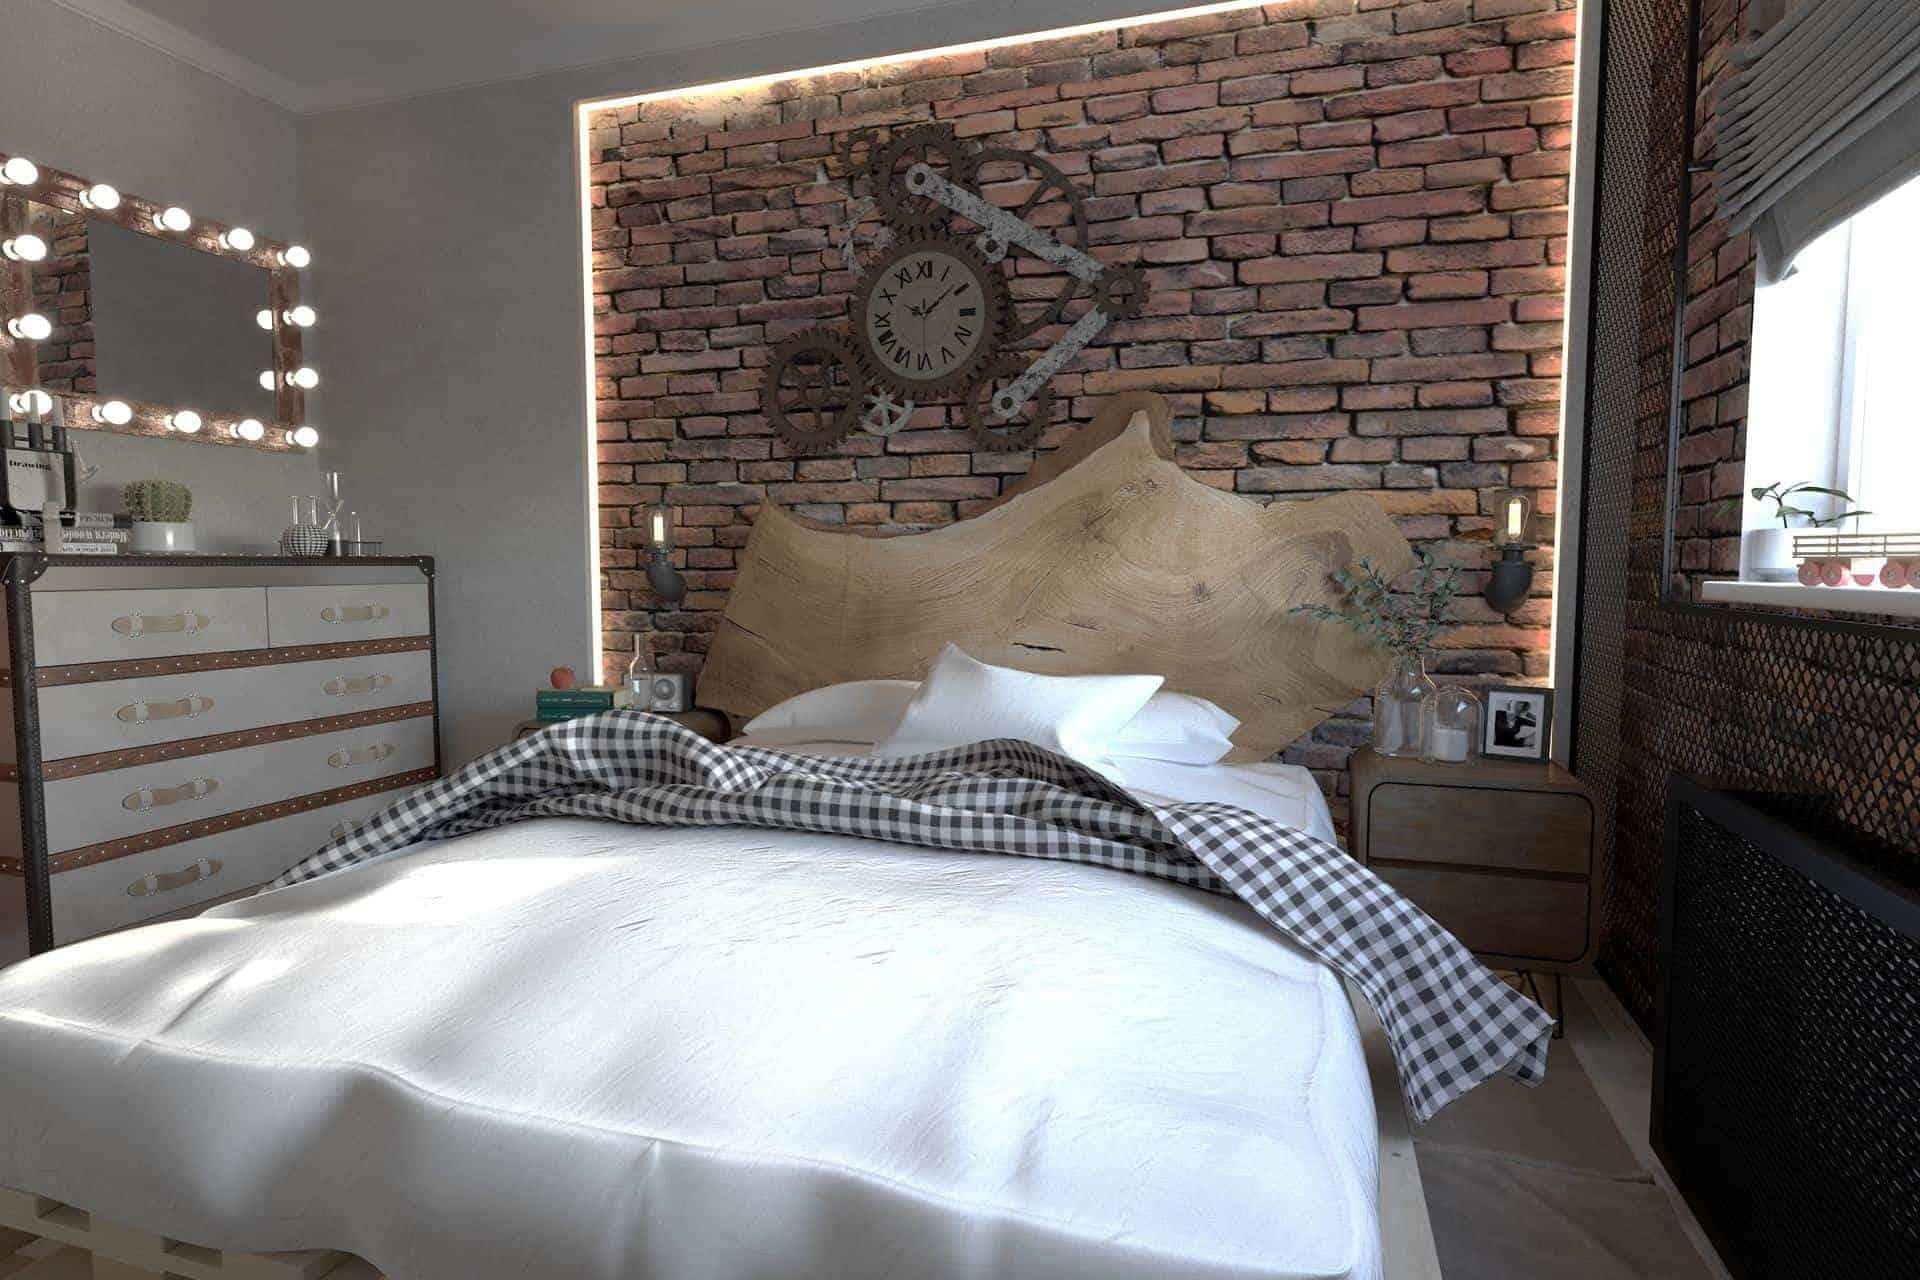 Cozy Loft Rooms - Design Ideas